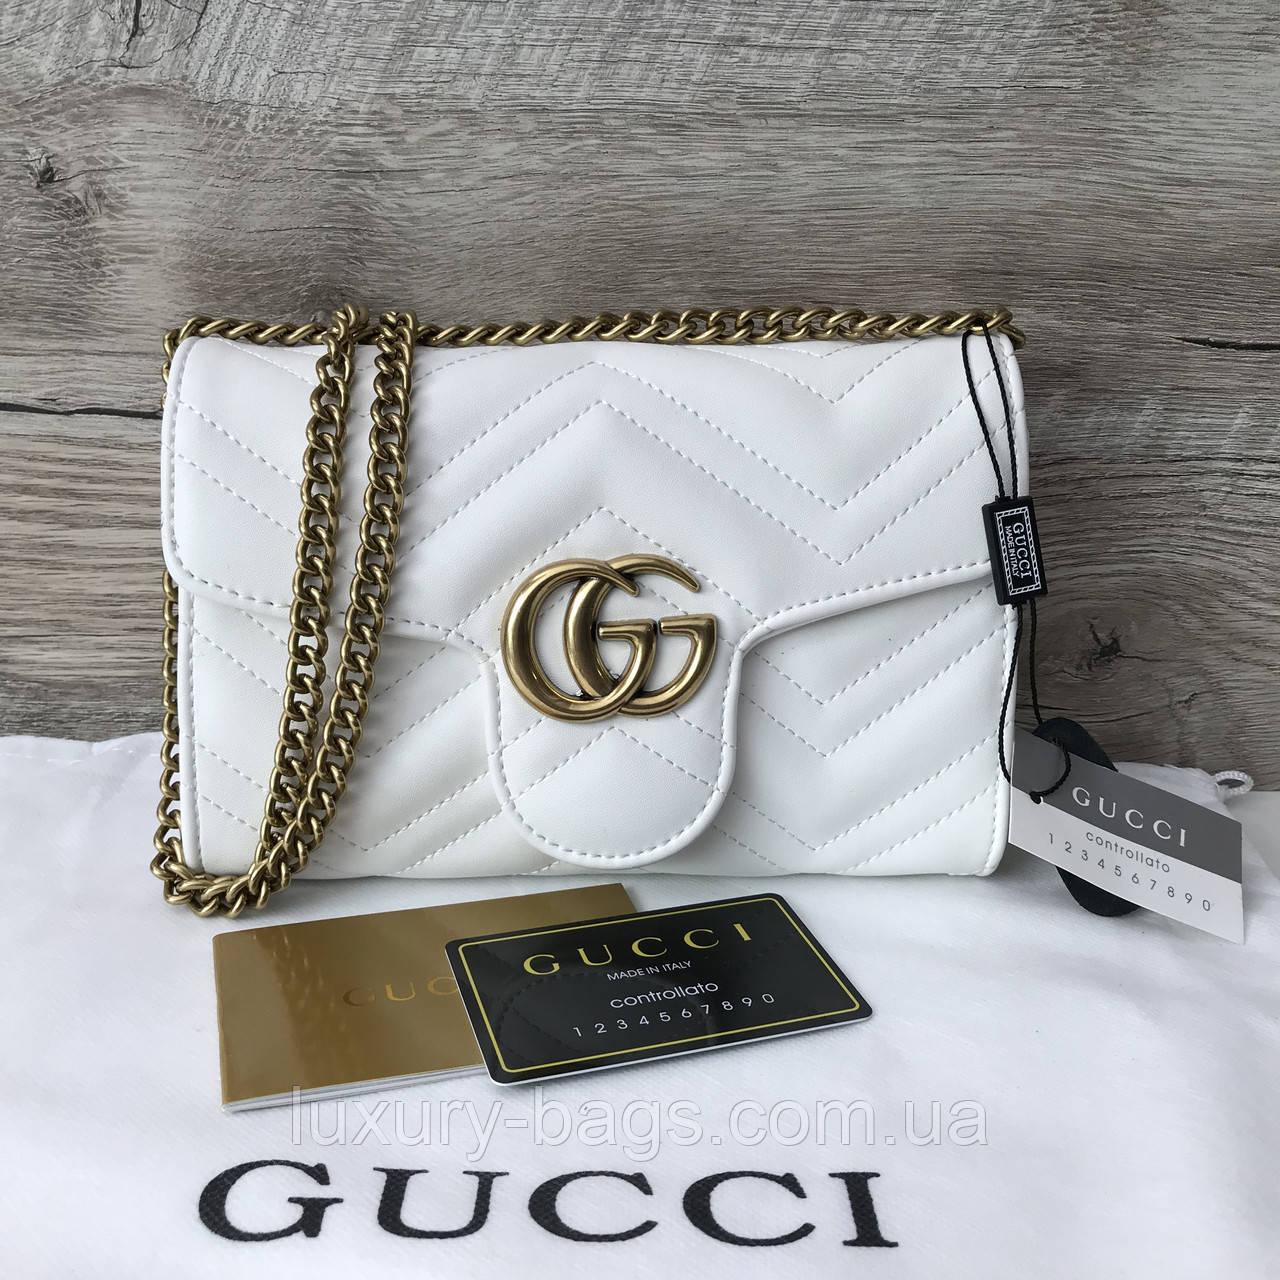 ccd5f10ae3f1 Женская сумка Gucci Гуччи опт: продажа, цена в Одессе. женские ...